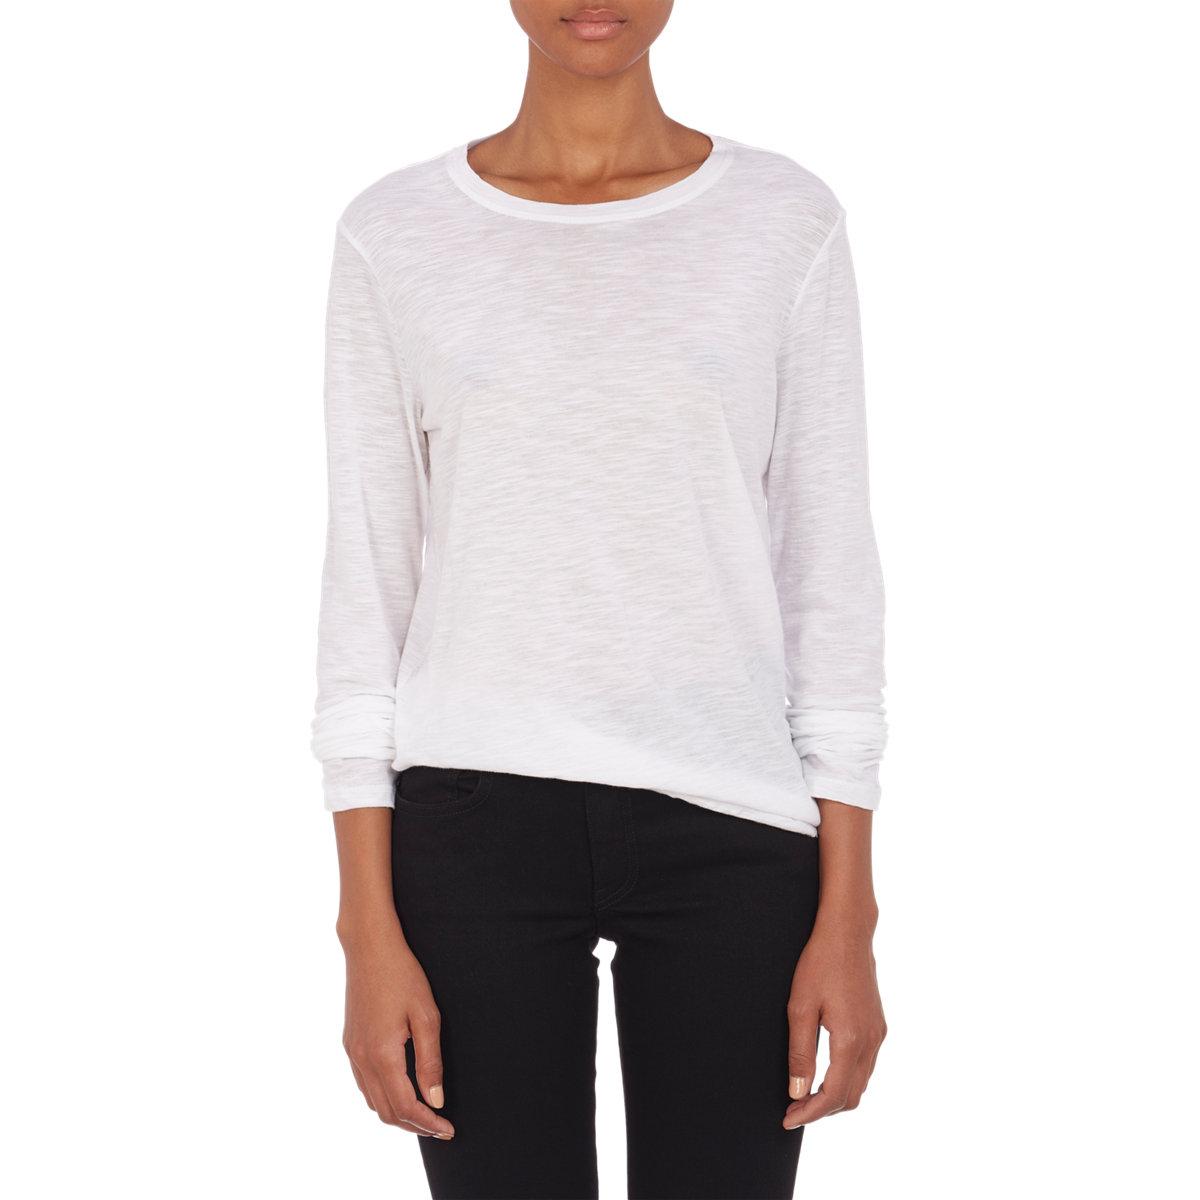 Proenza schouler slub knit t shirt in white lyst for What is a slub shirt